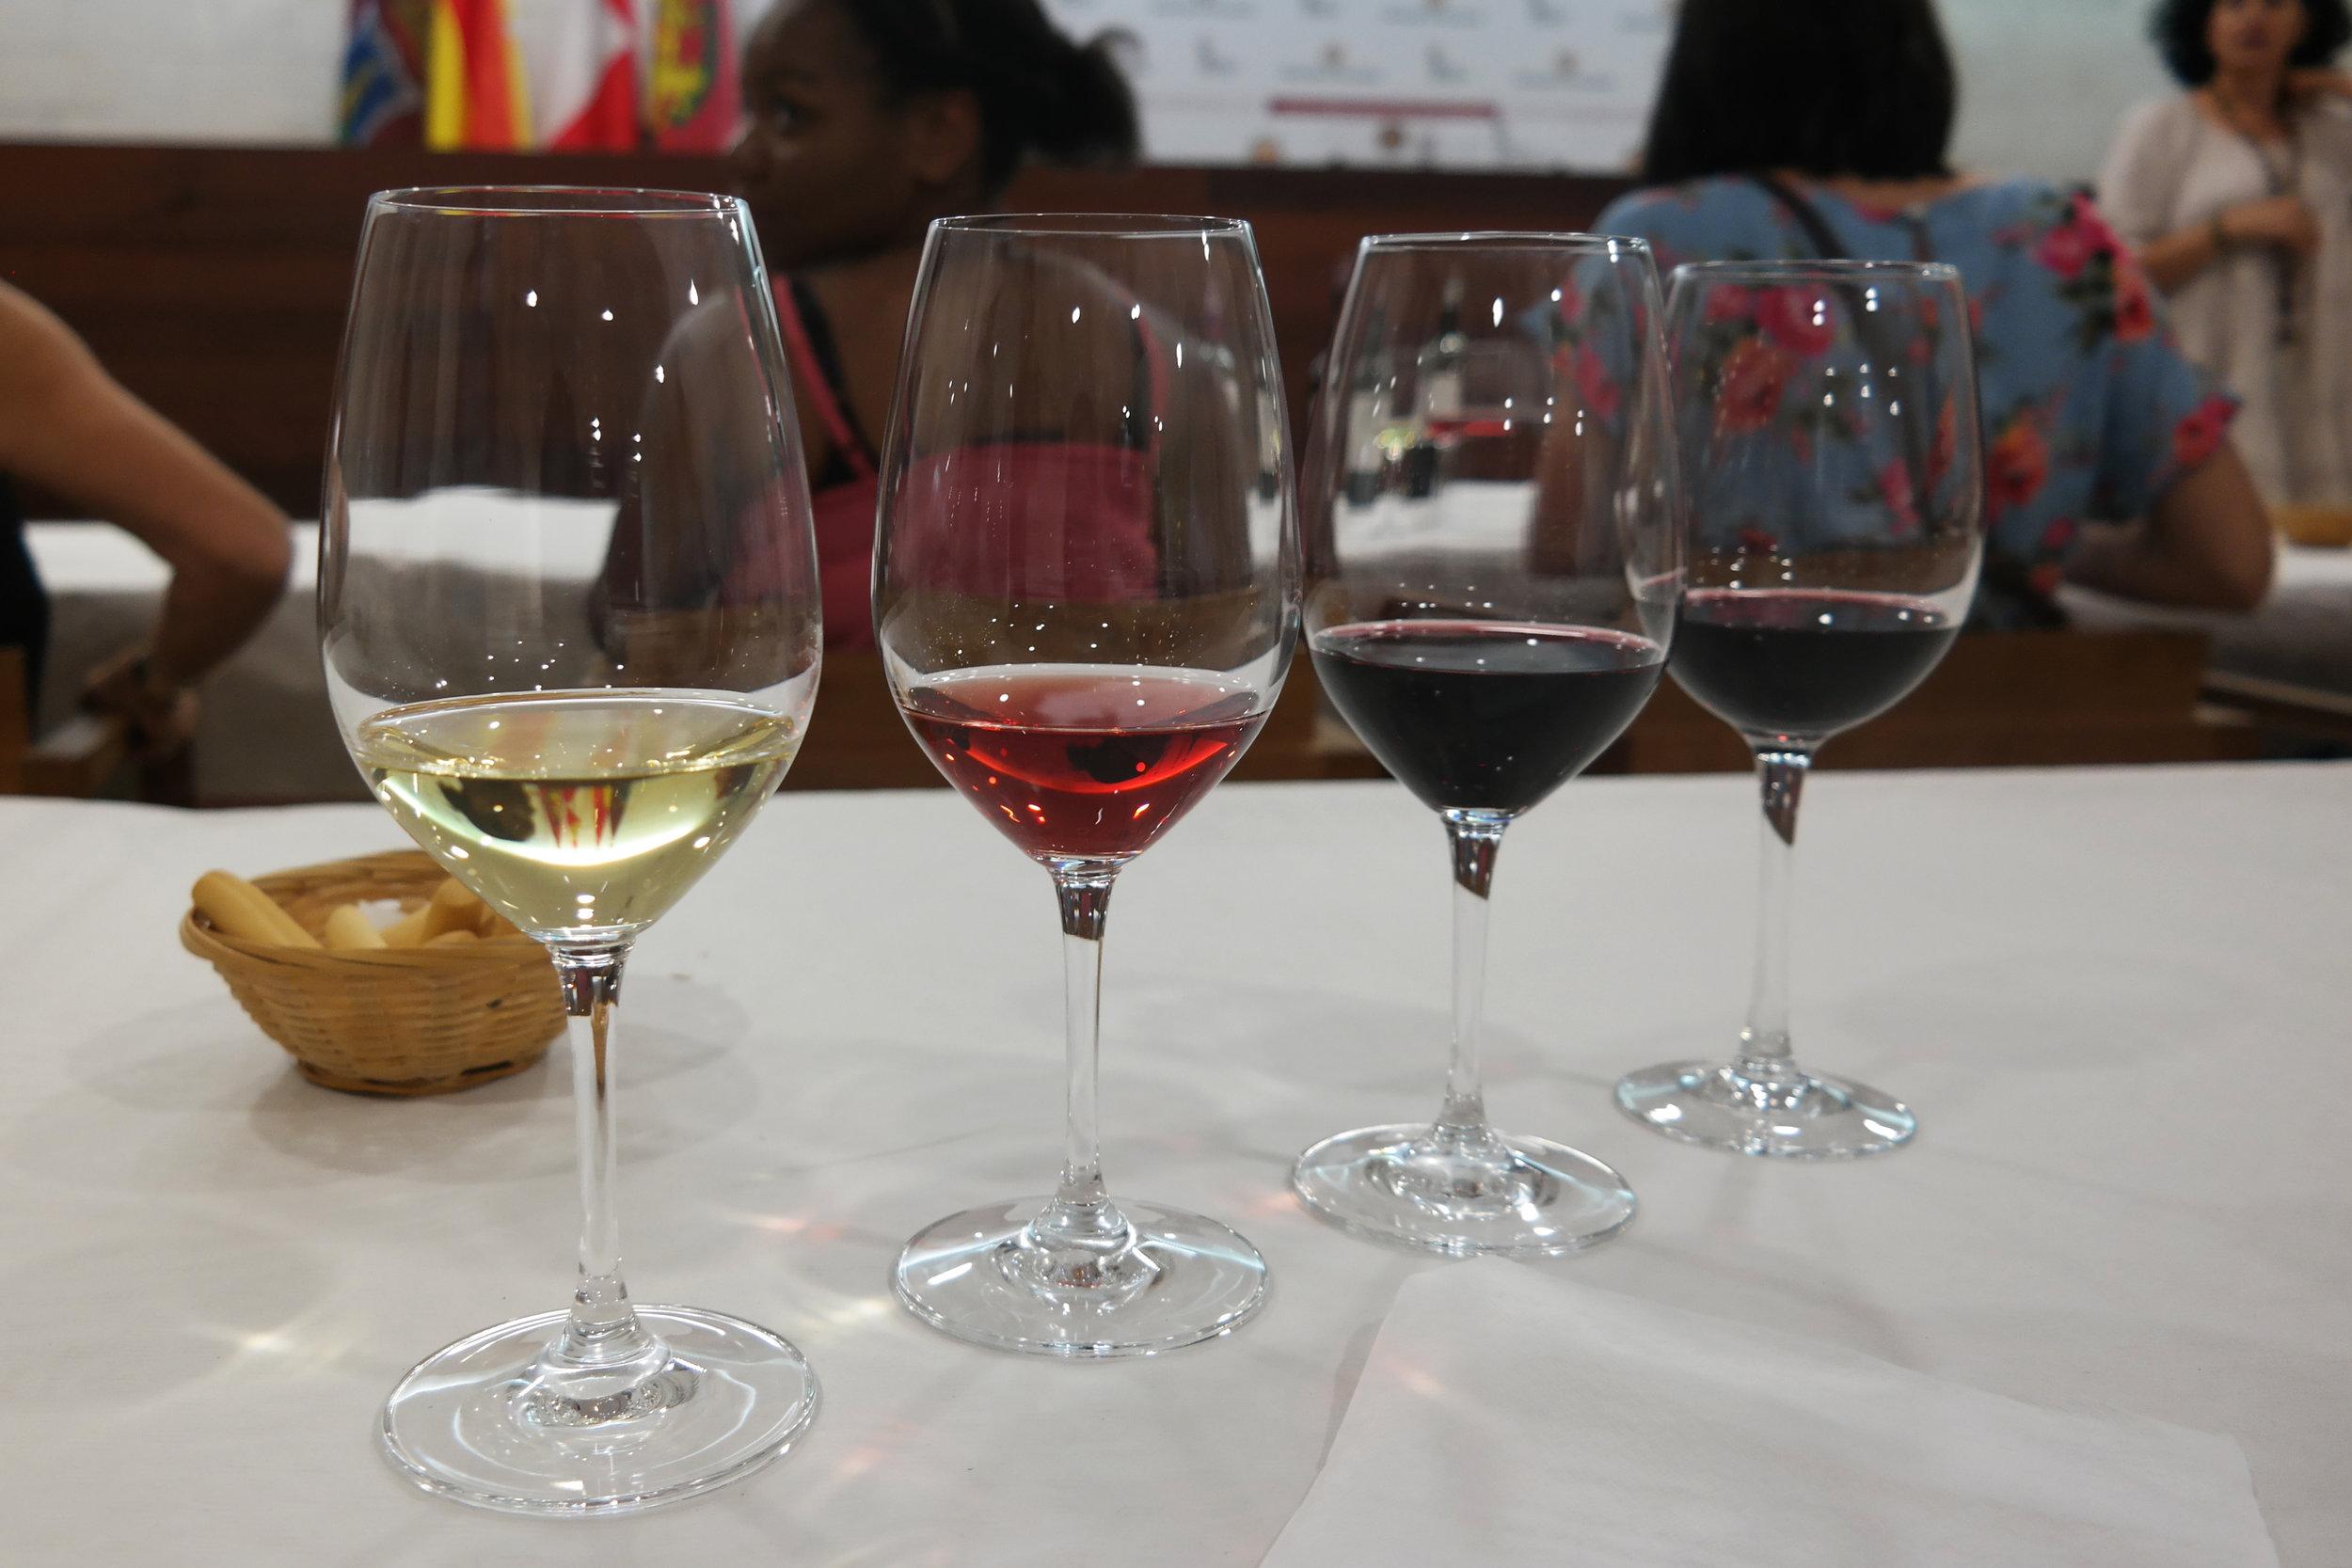 Cata de vino en Peñafiel.